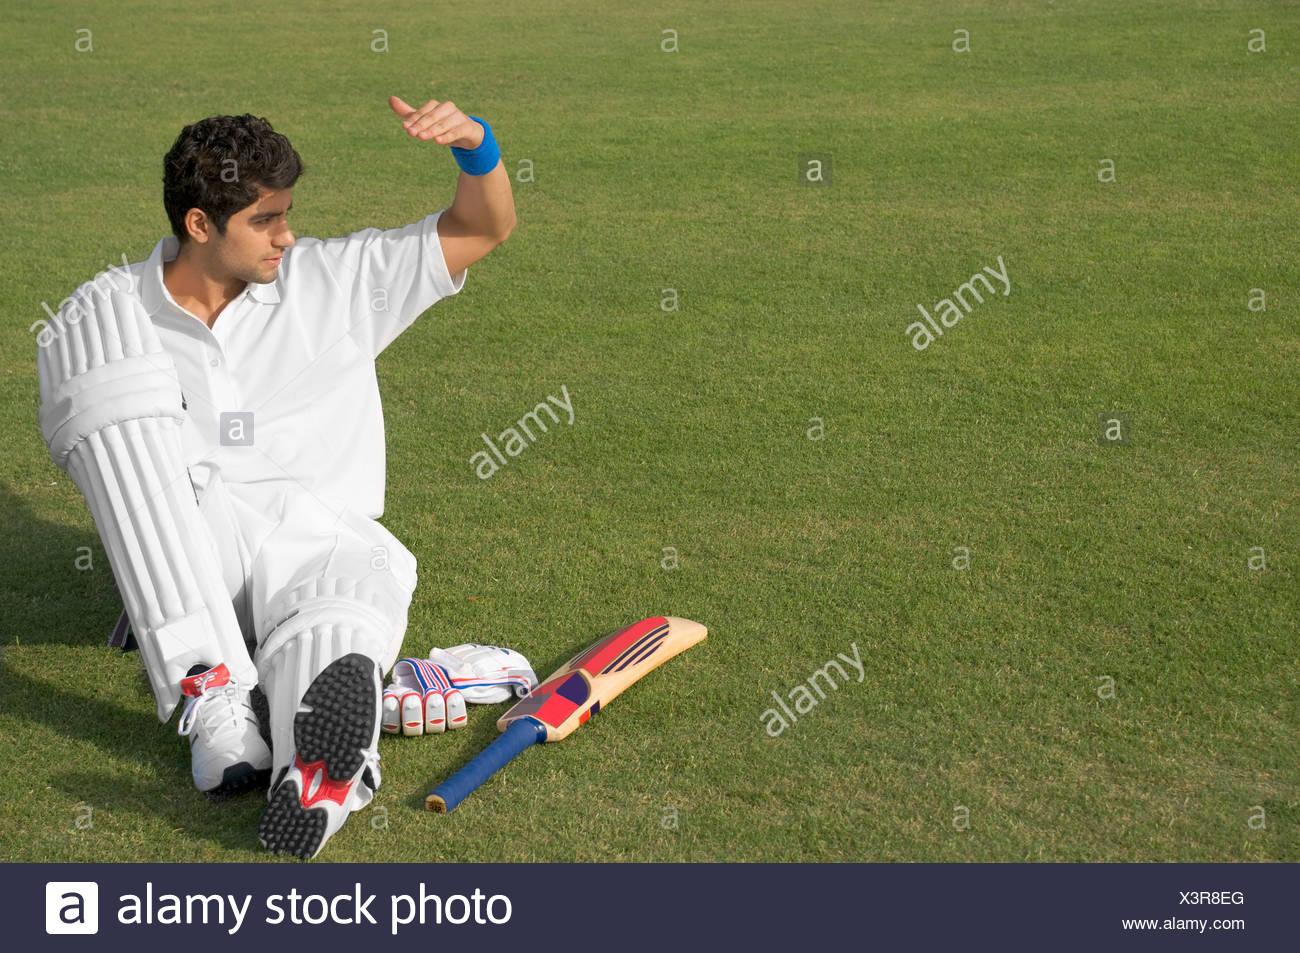 Batsman relaxing - Stock Image